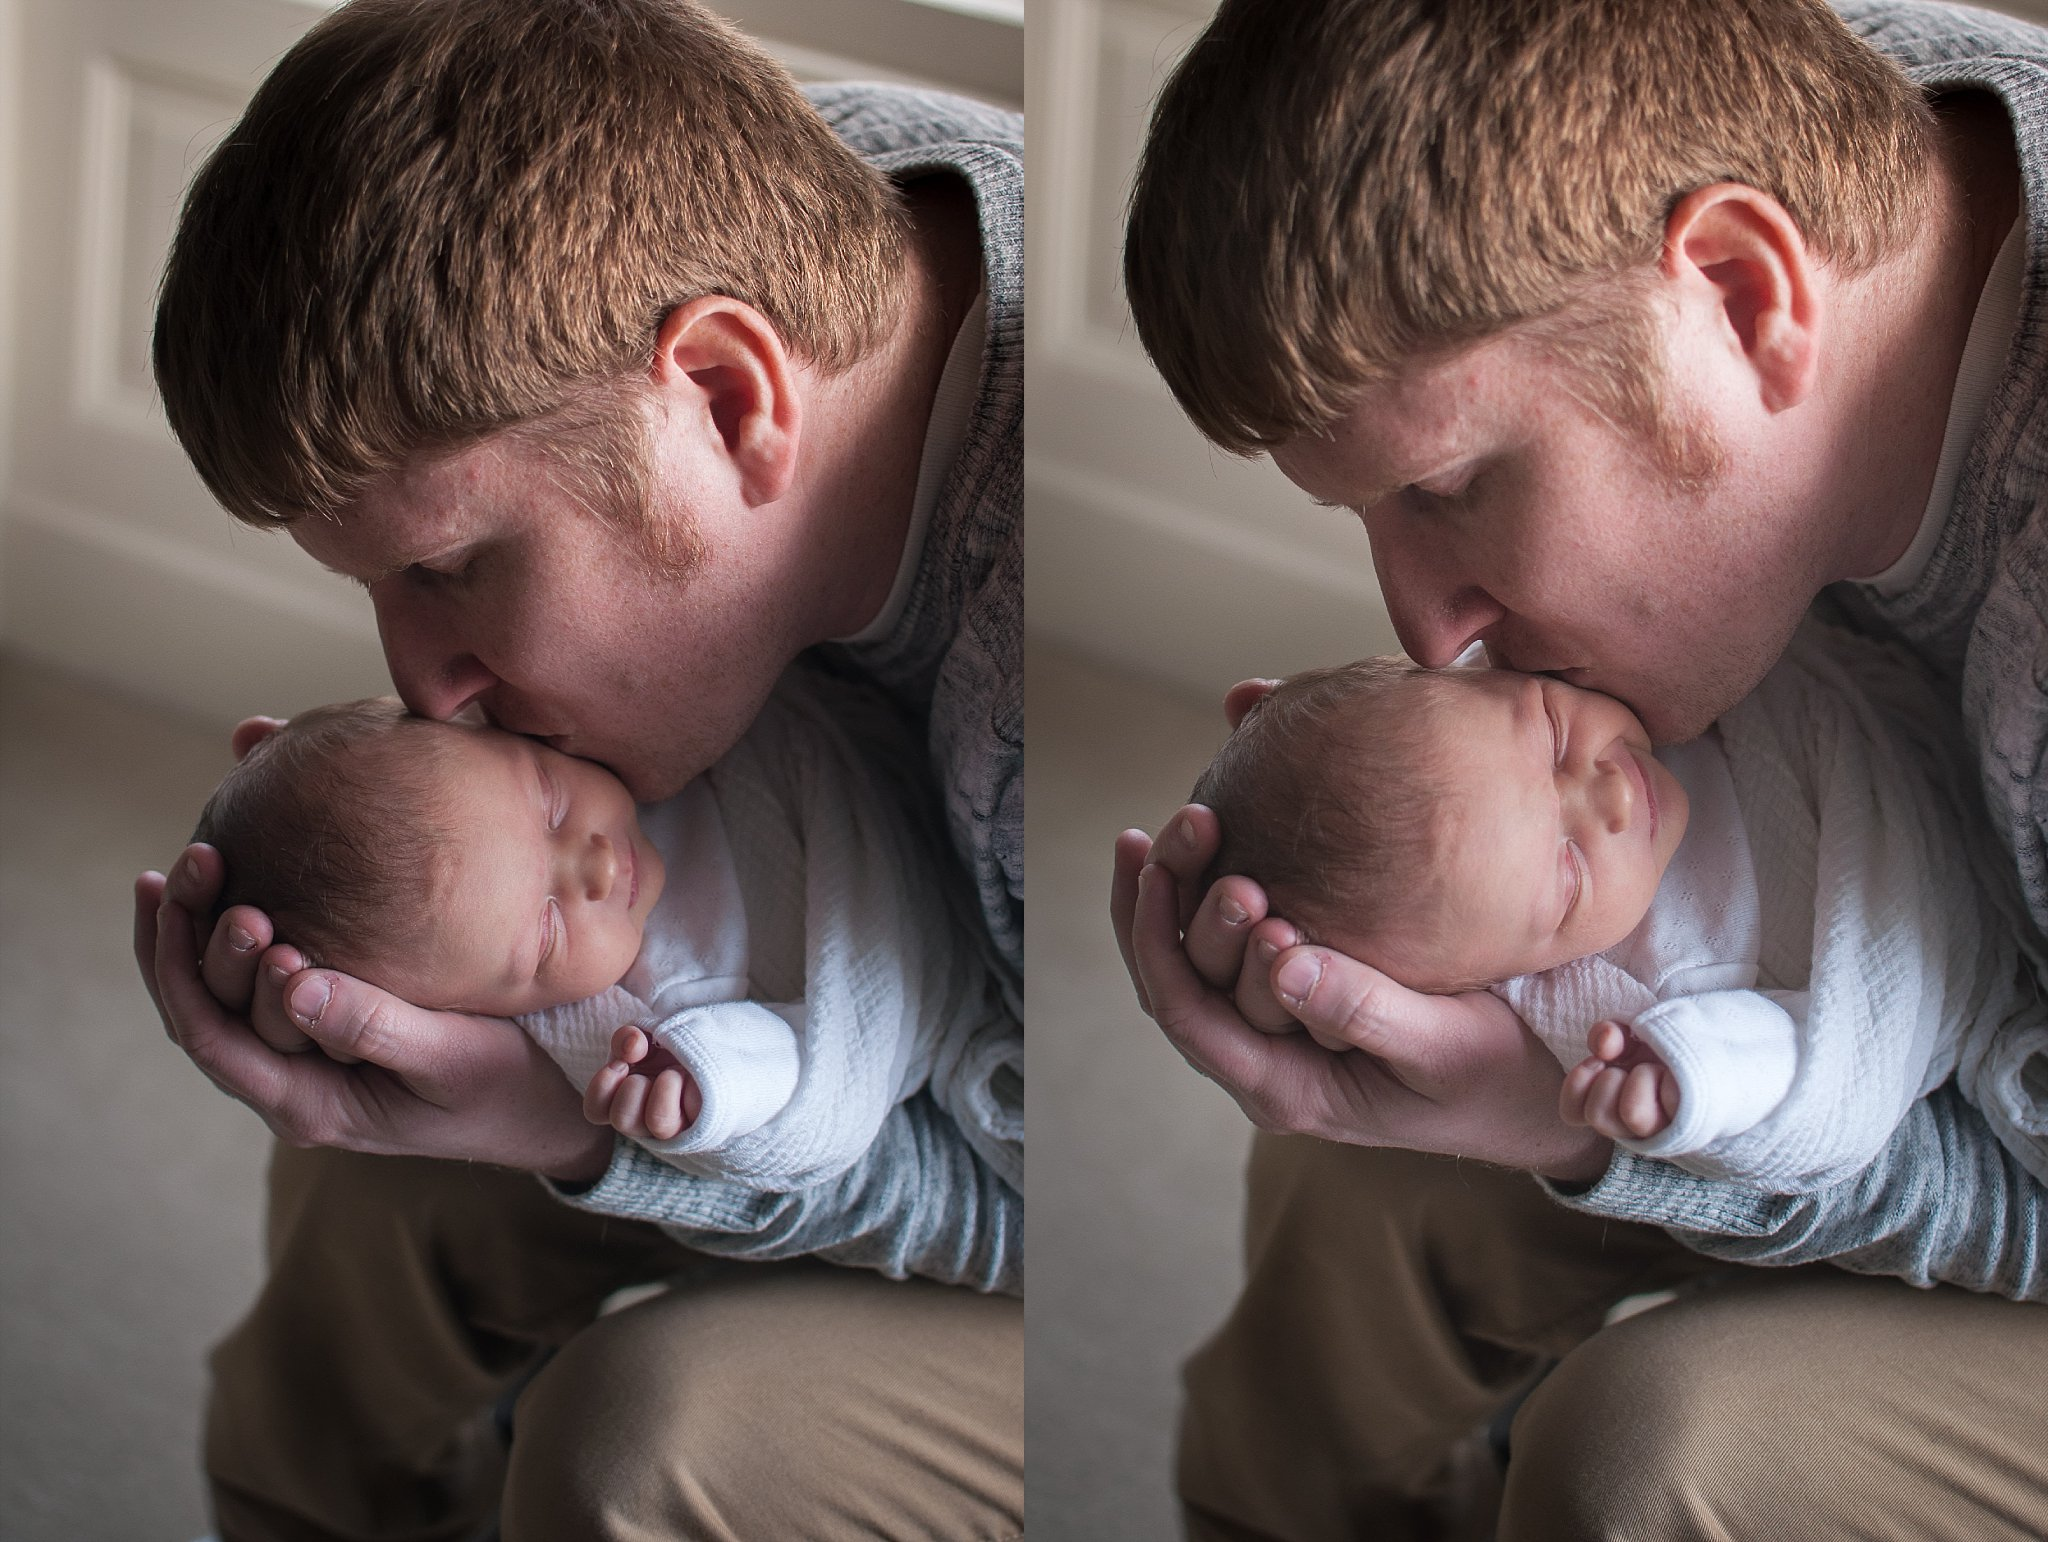 Dad kisses newborn baby on the cheek.